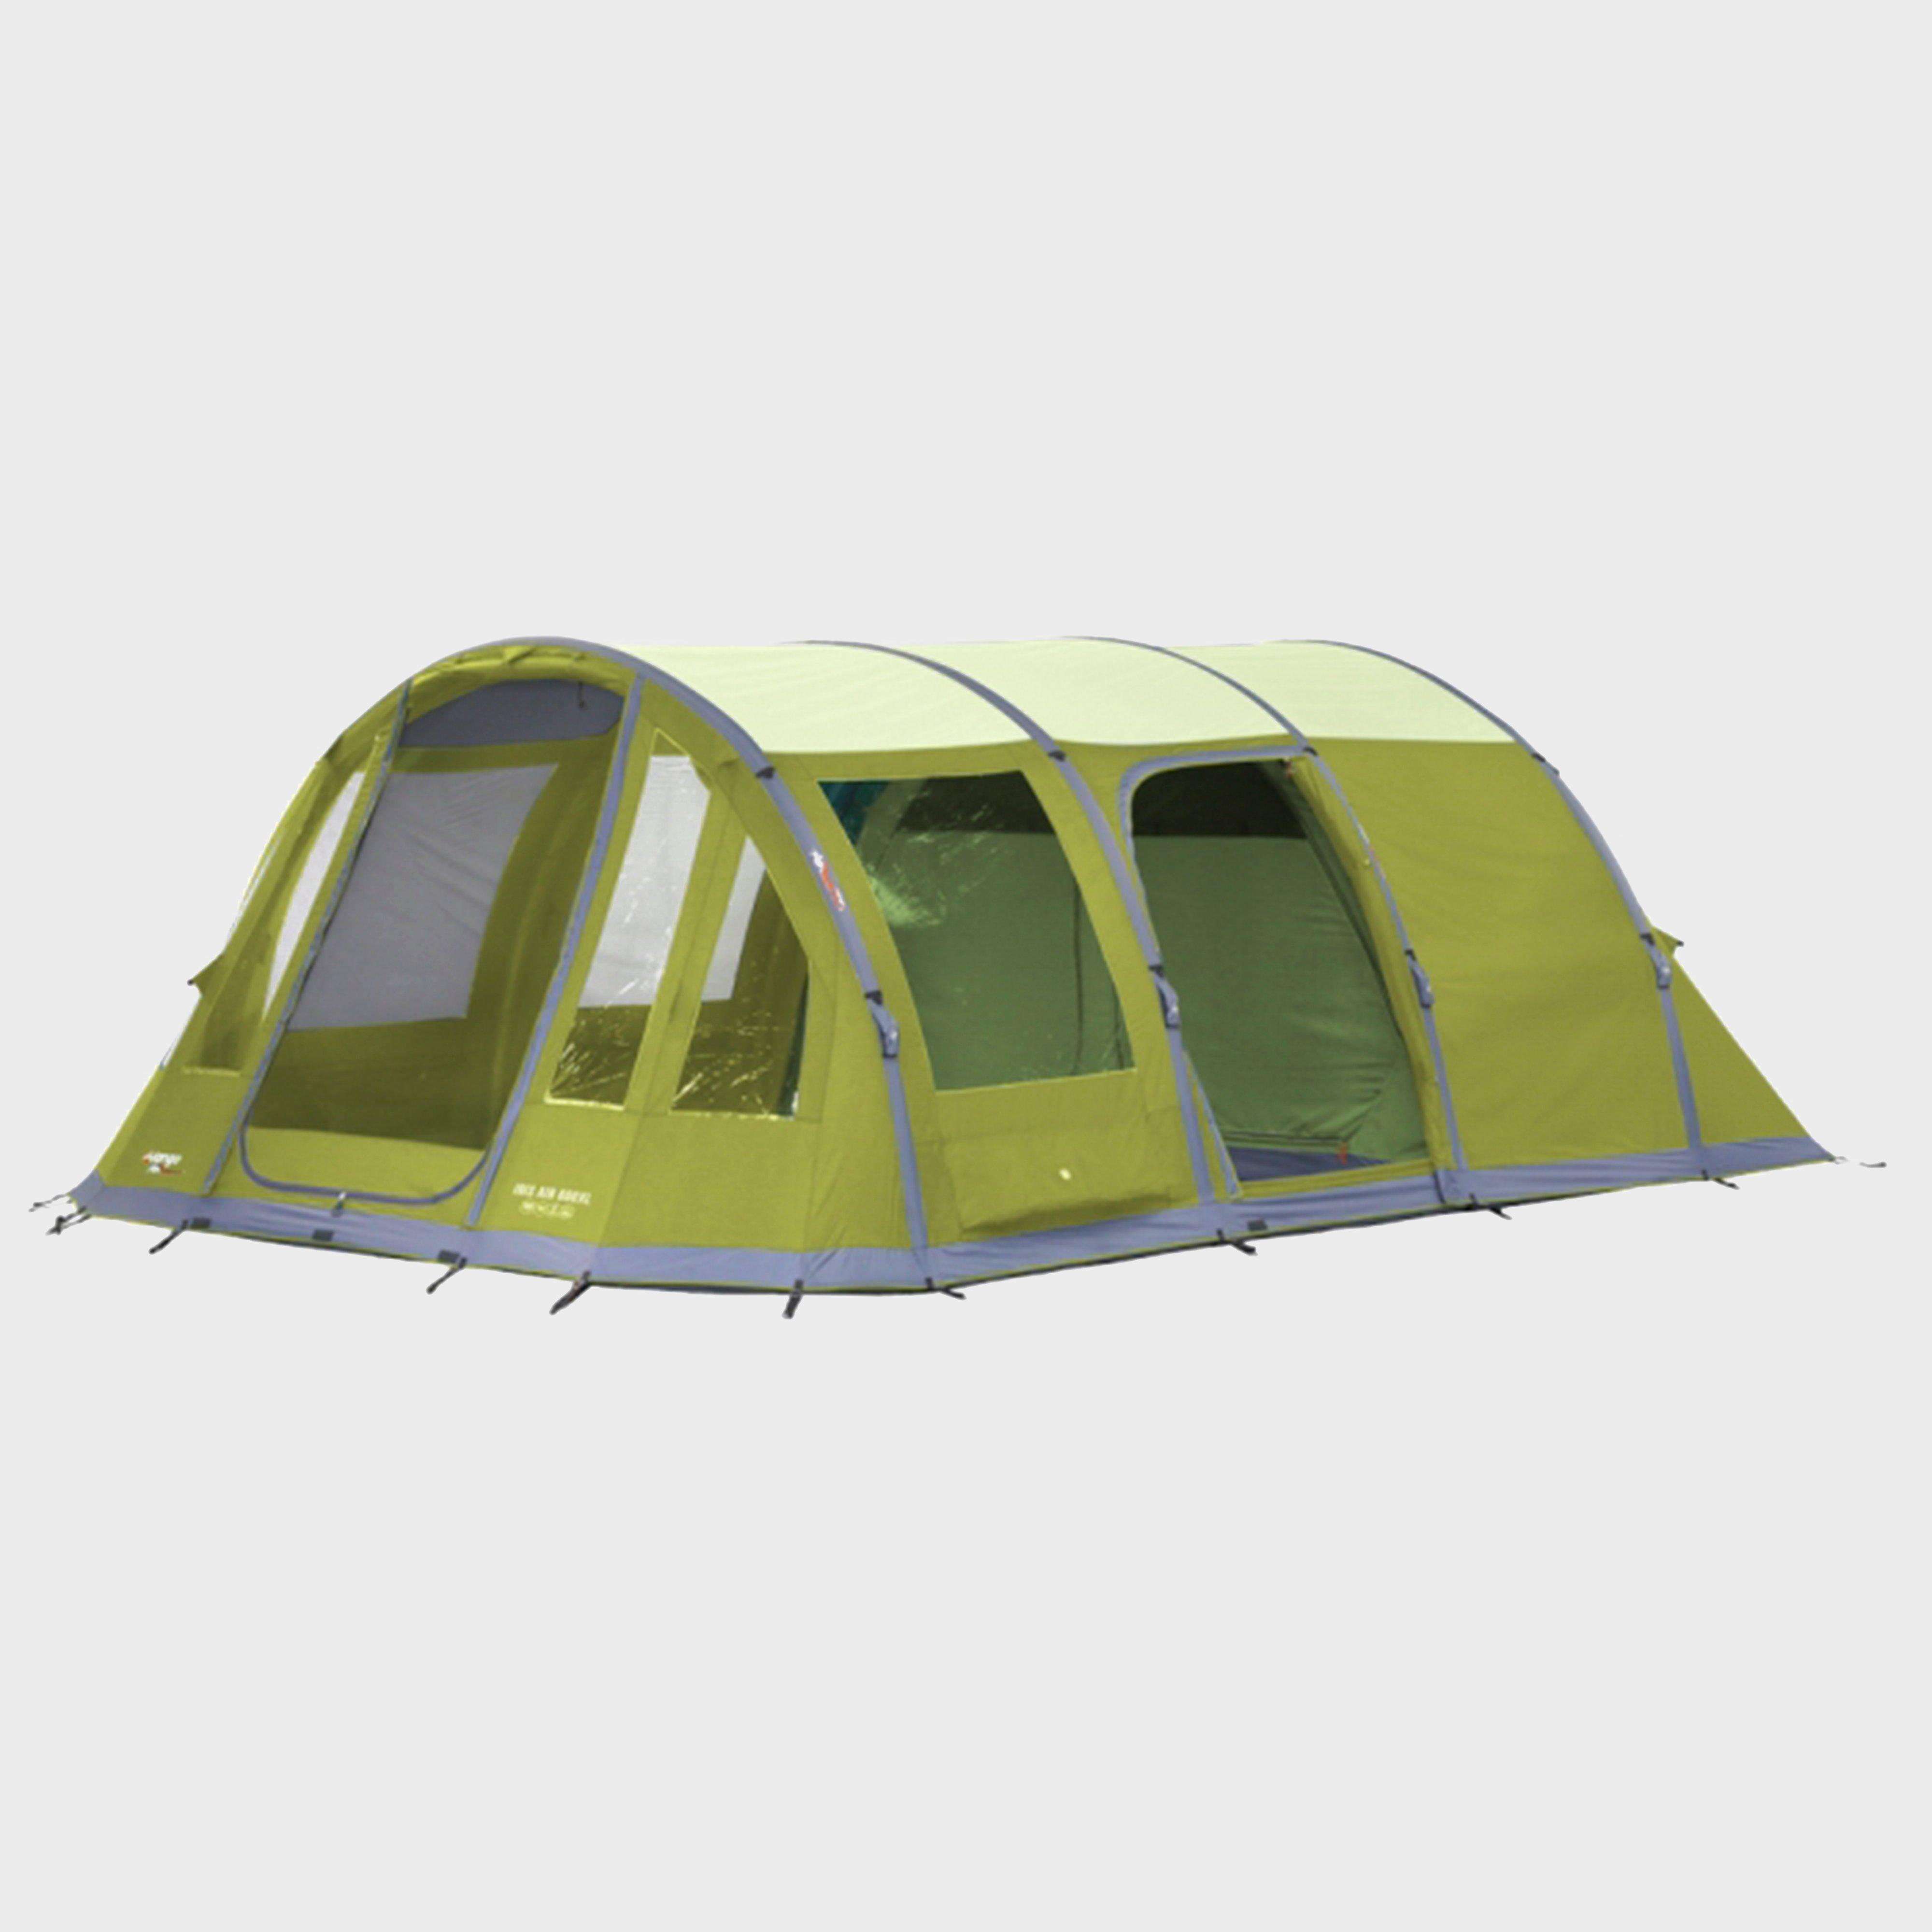 Vango Vango Iris Air 600 XL Tent - Green, Green